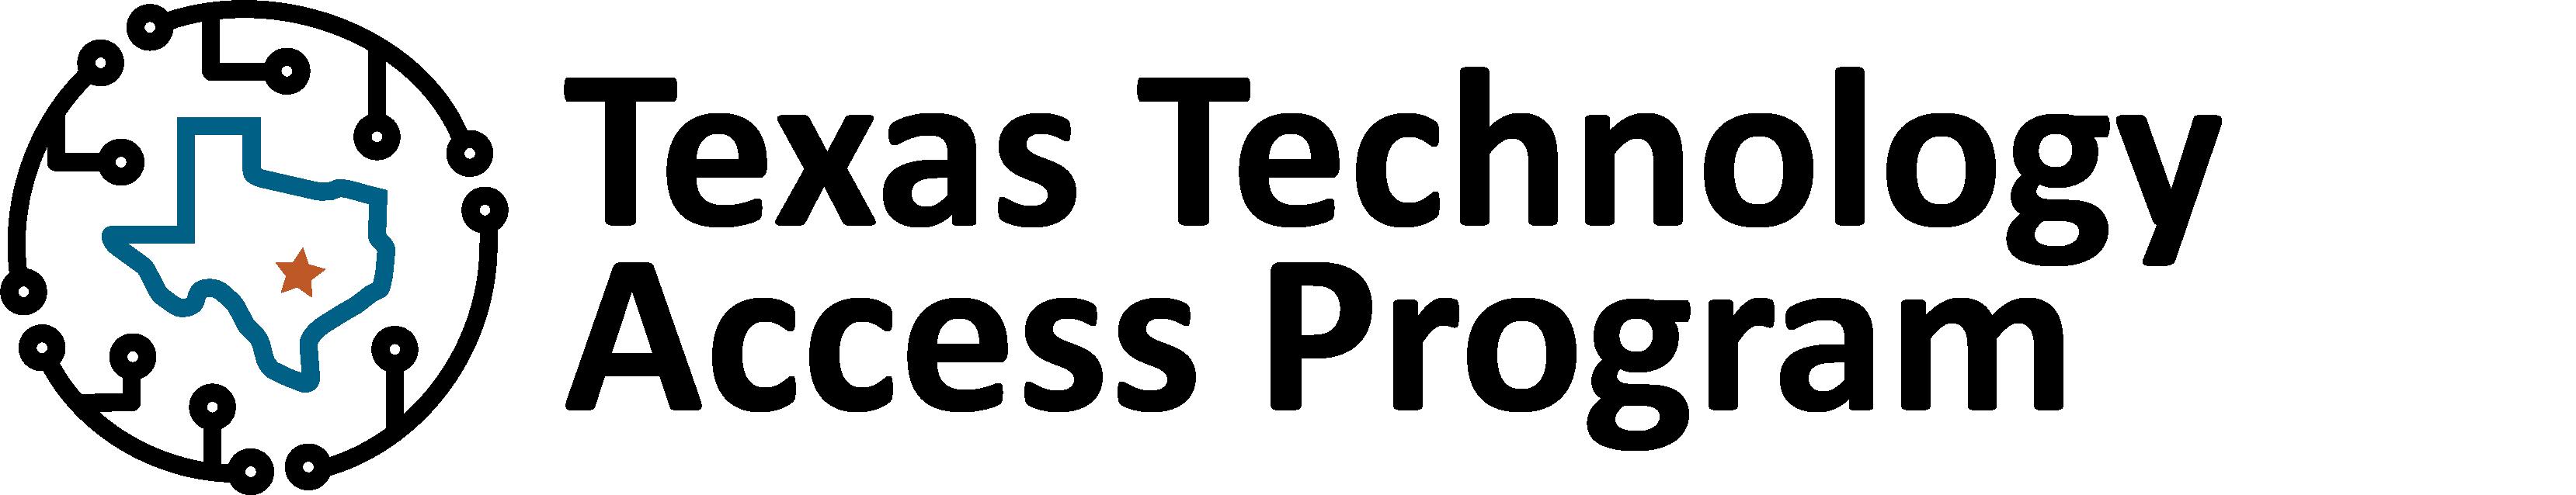 Texas Technology Access Program logo